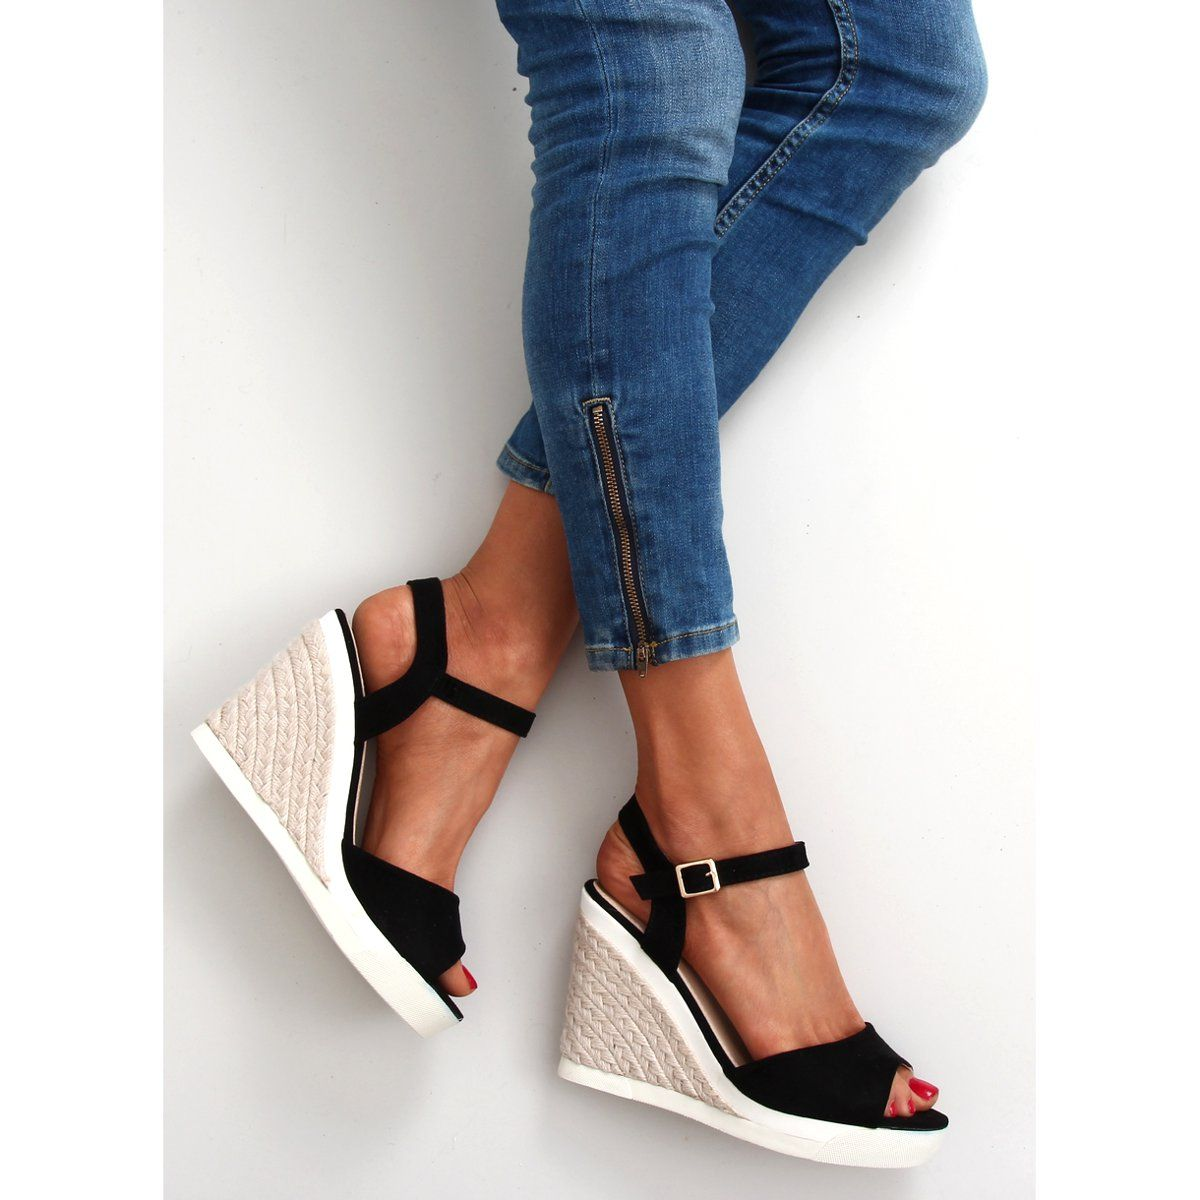 Sportowe Sandalki Na Koturnie At 0605 L Black Czarne Wedge Espadrille Espadrilles Shoes